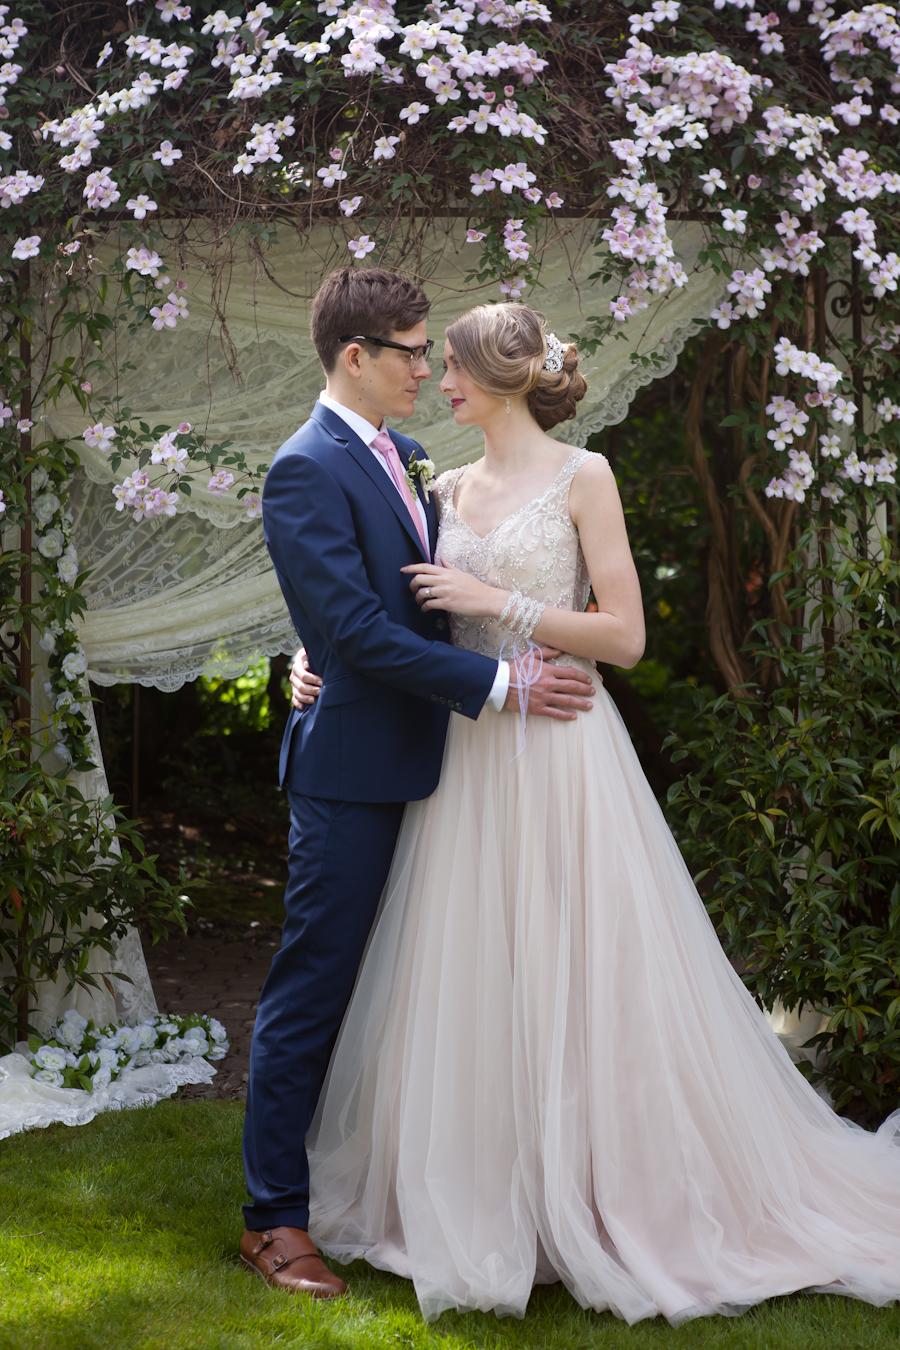 Lace arbour by Designer Weddings Victoria BC